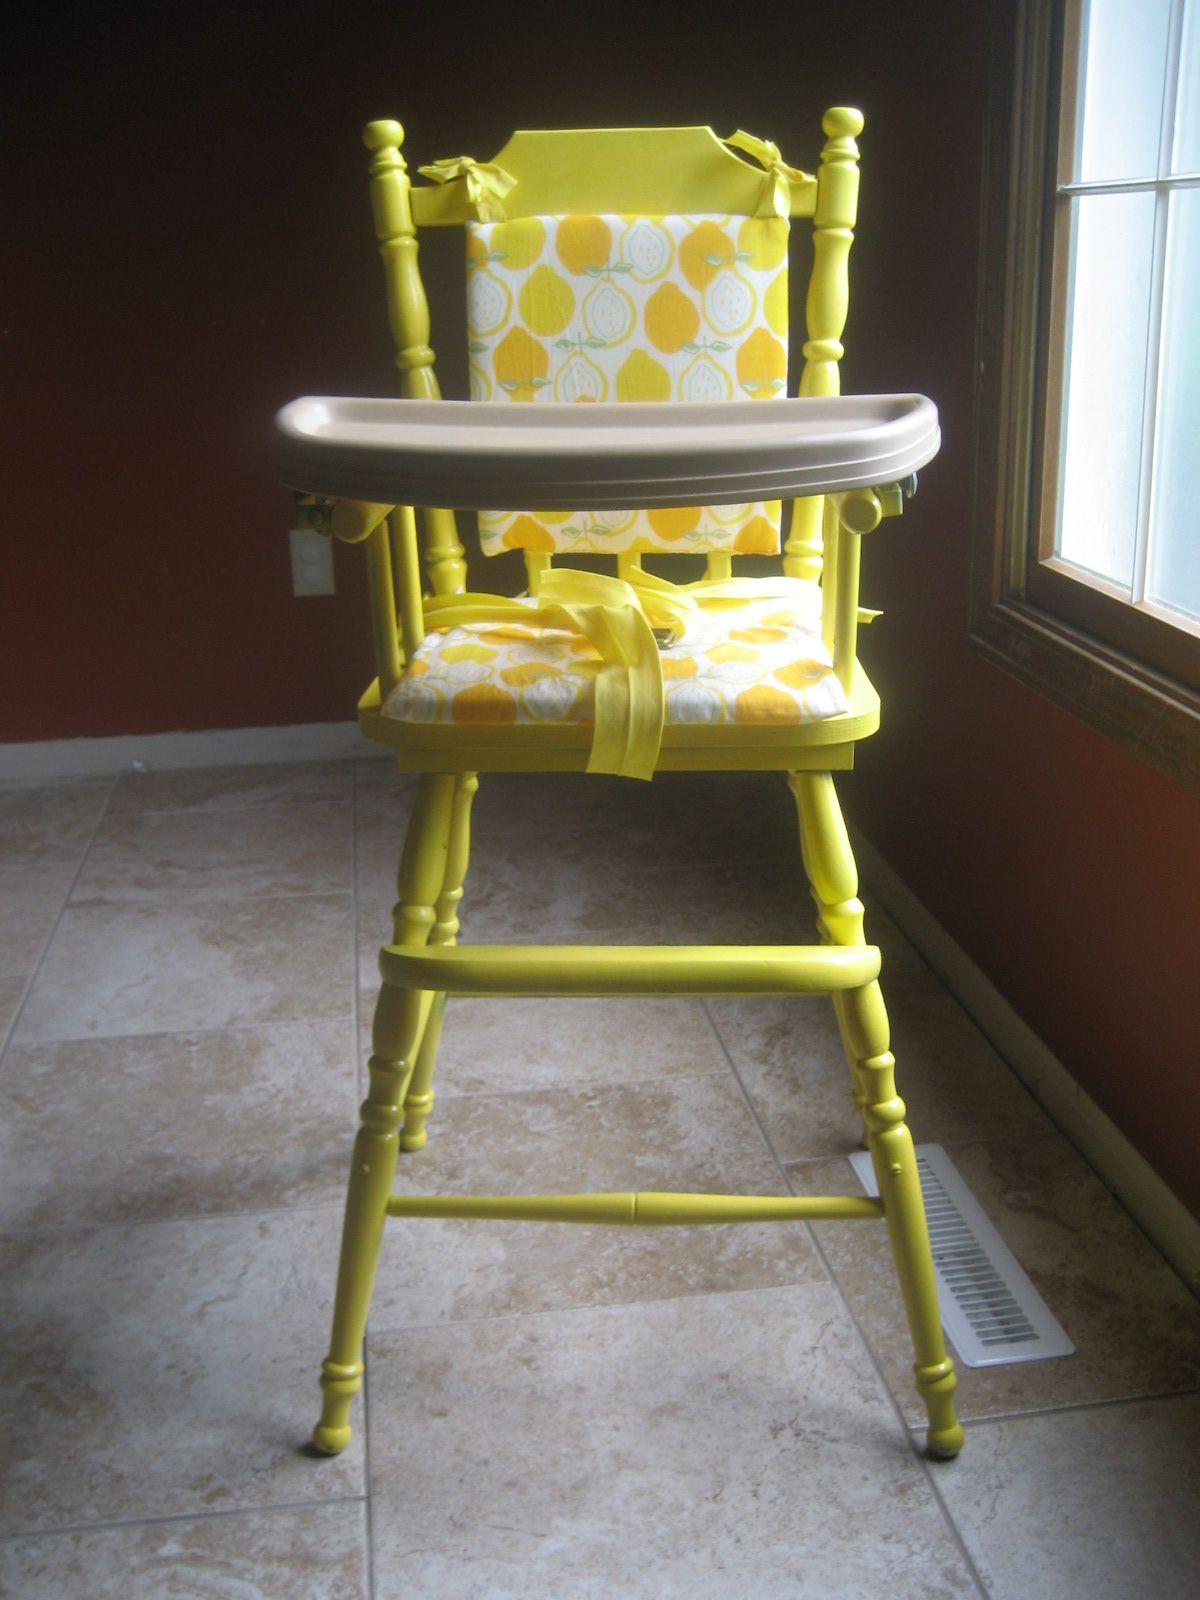 A Little Lemon Whimsy Chair, Wood diy